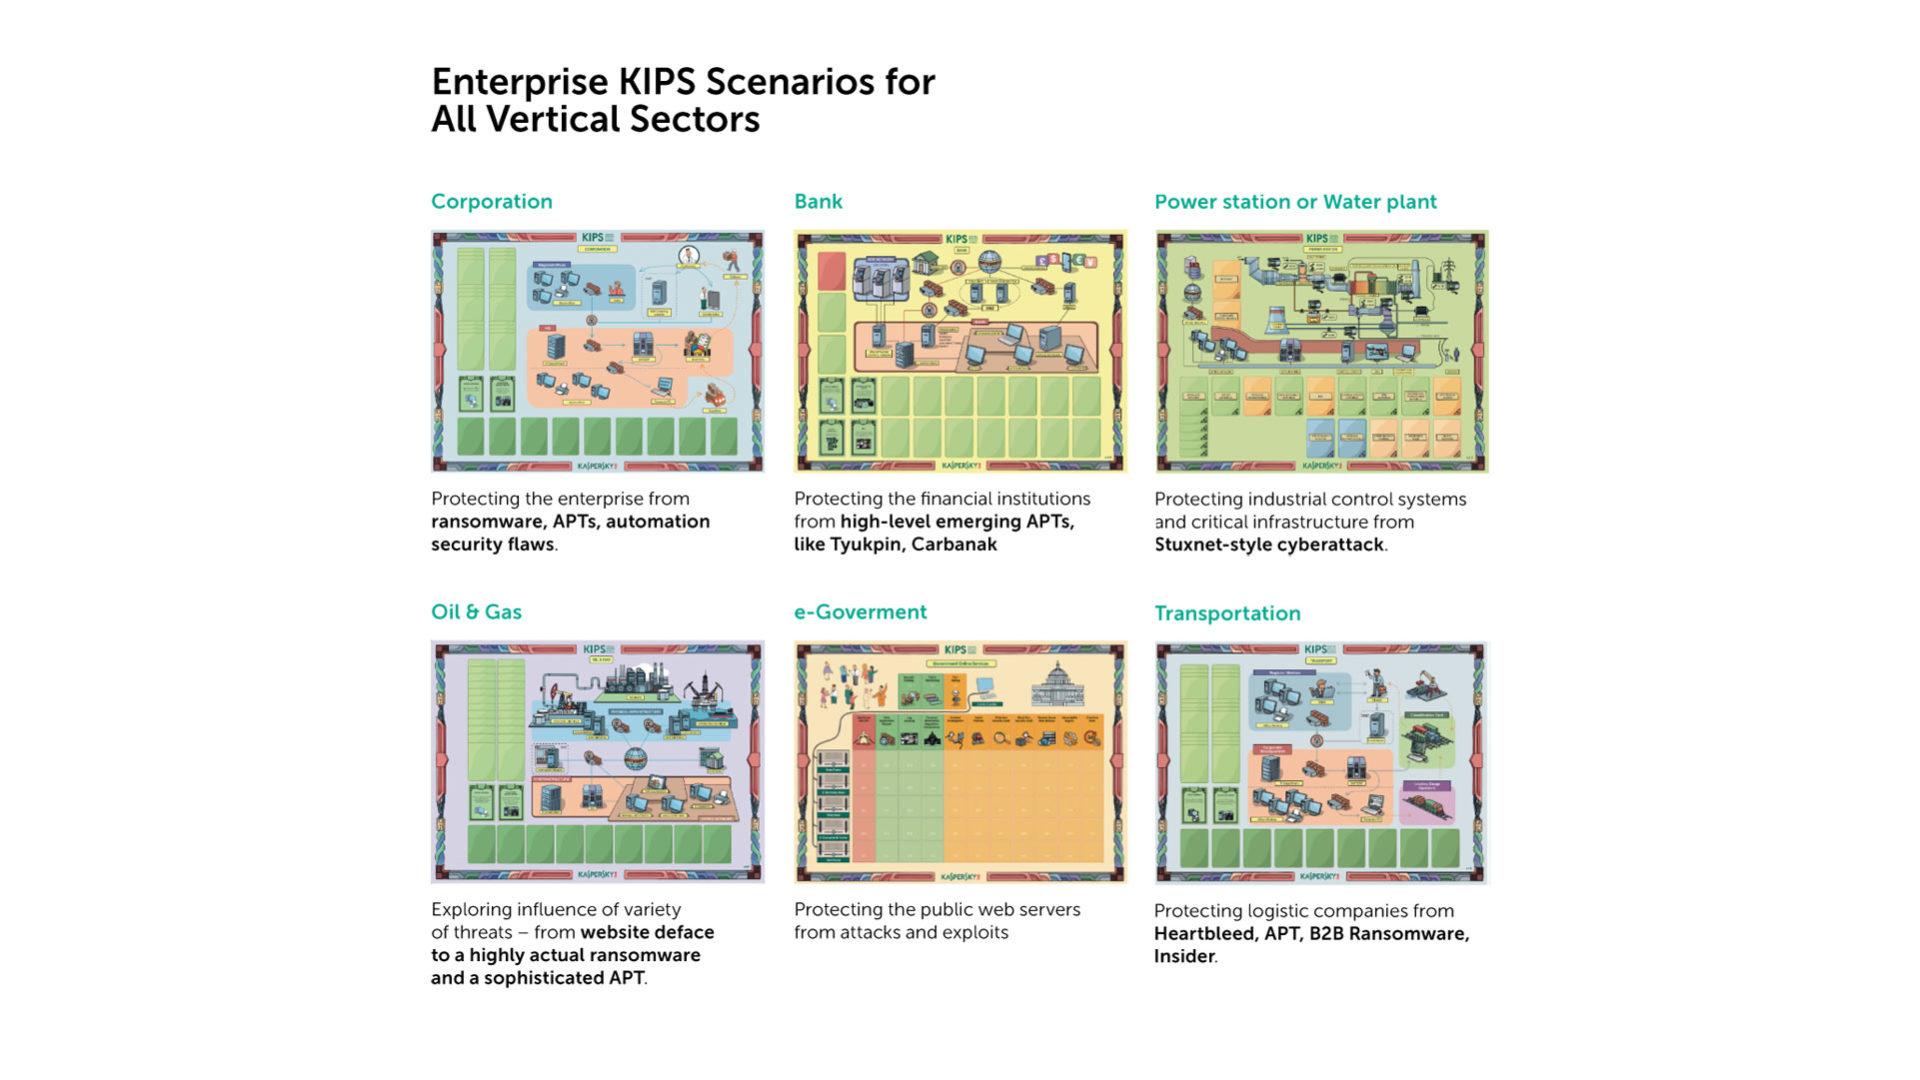 schermate degli scenari kips per i settori verticali